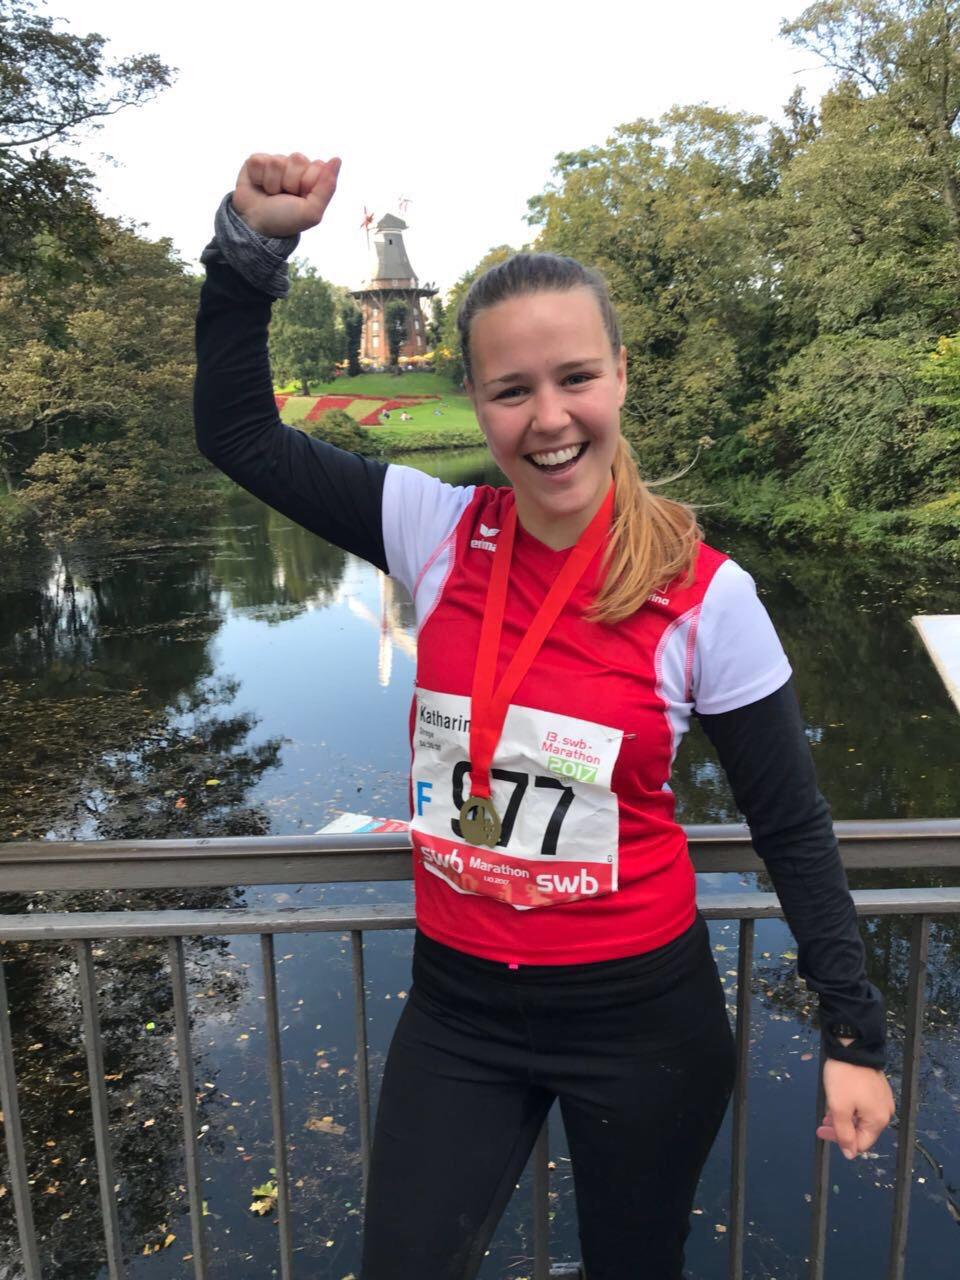 Katharina runs her first Marathon